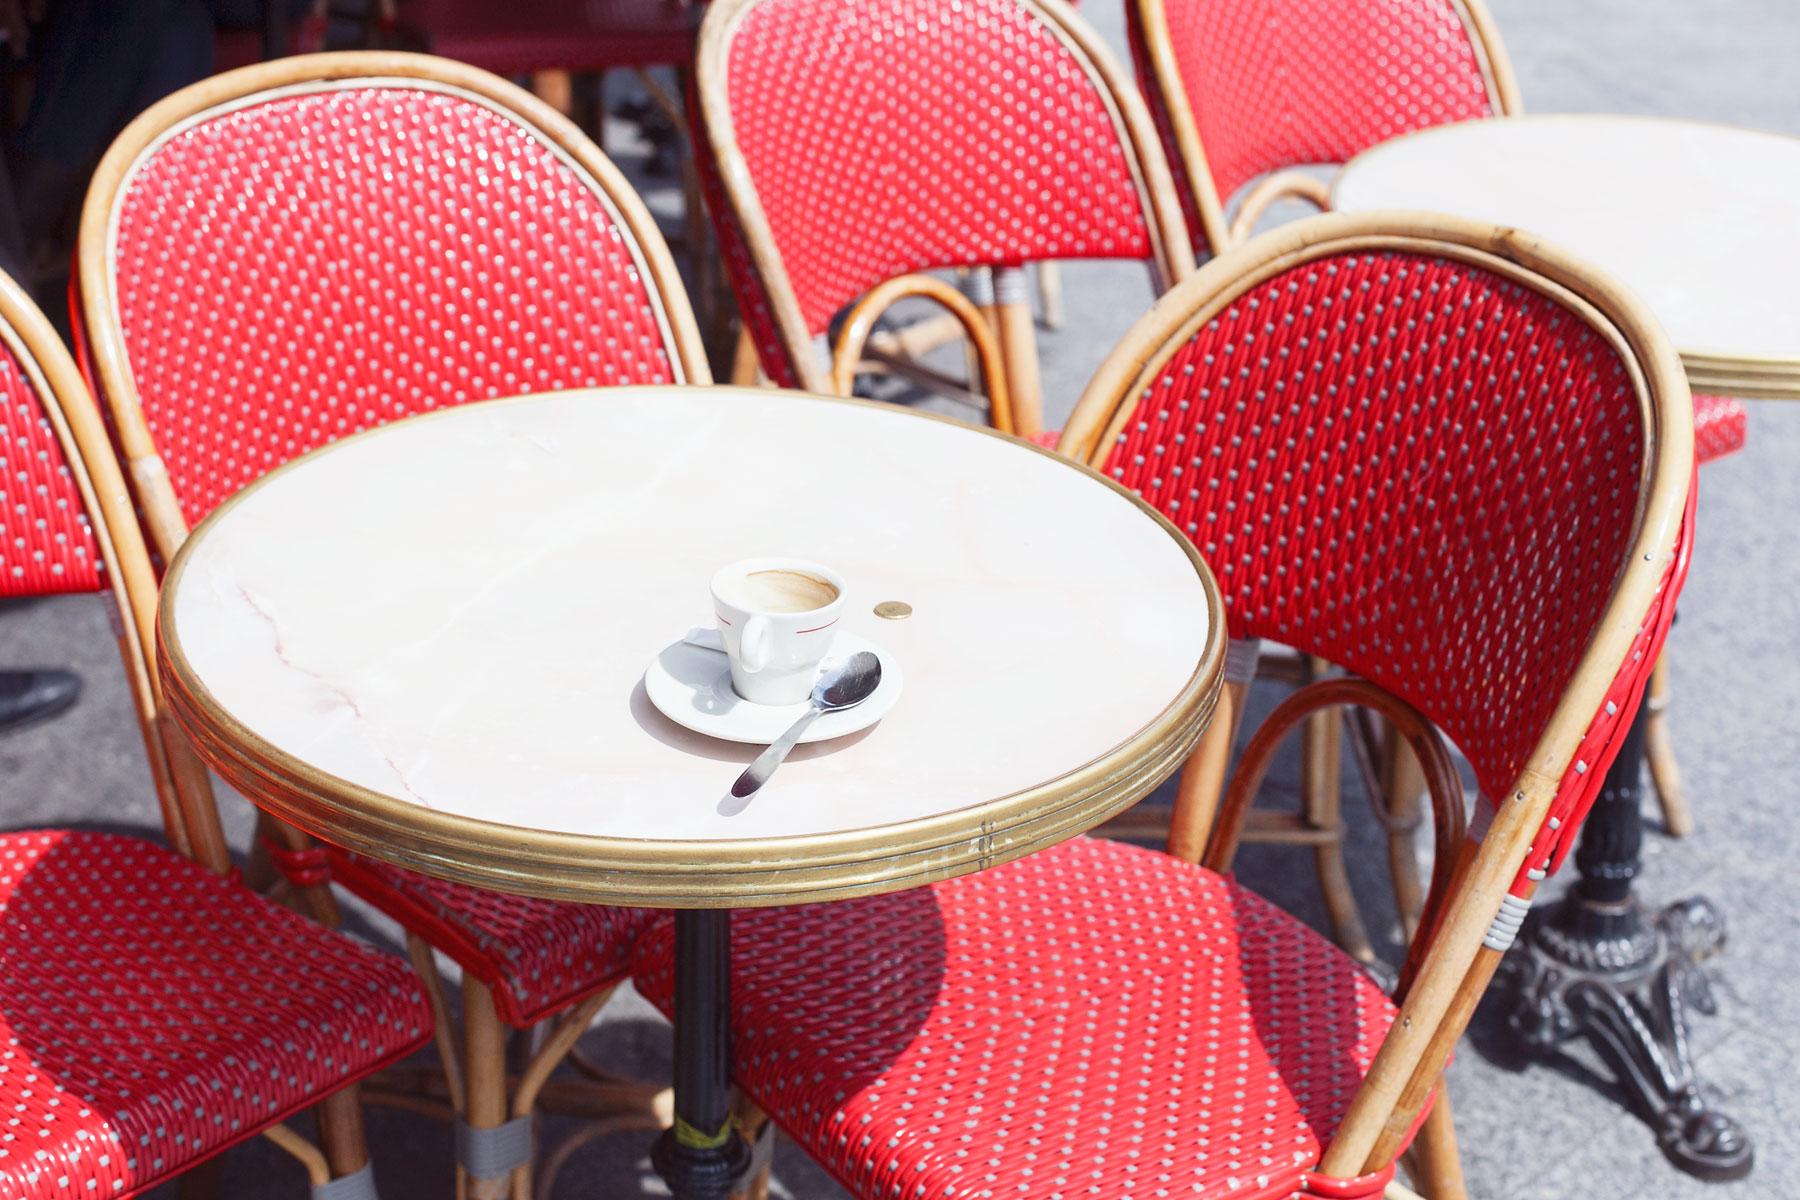 Parisian café by Carin Olsson (Paris in Four Months)